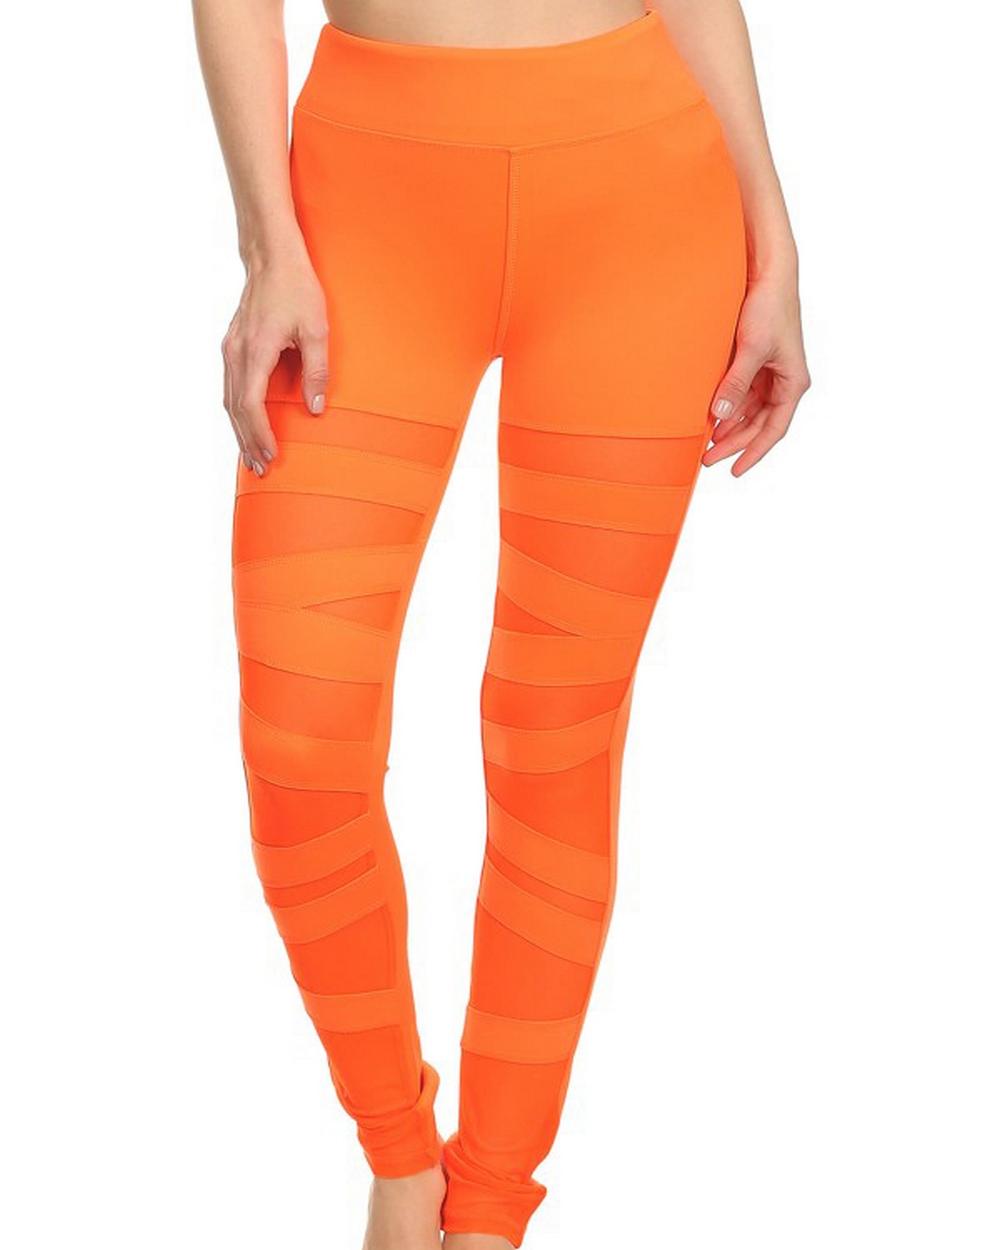 2016 Electric Yoga Ballerina Lace Up Legging in Orange